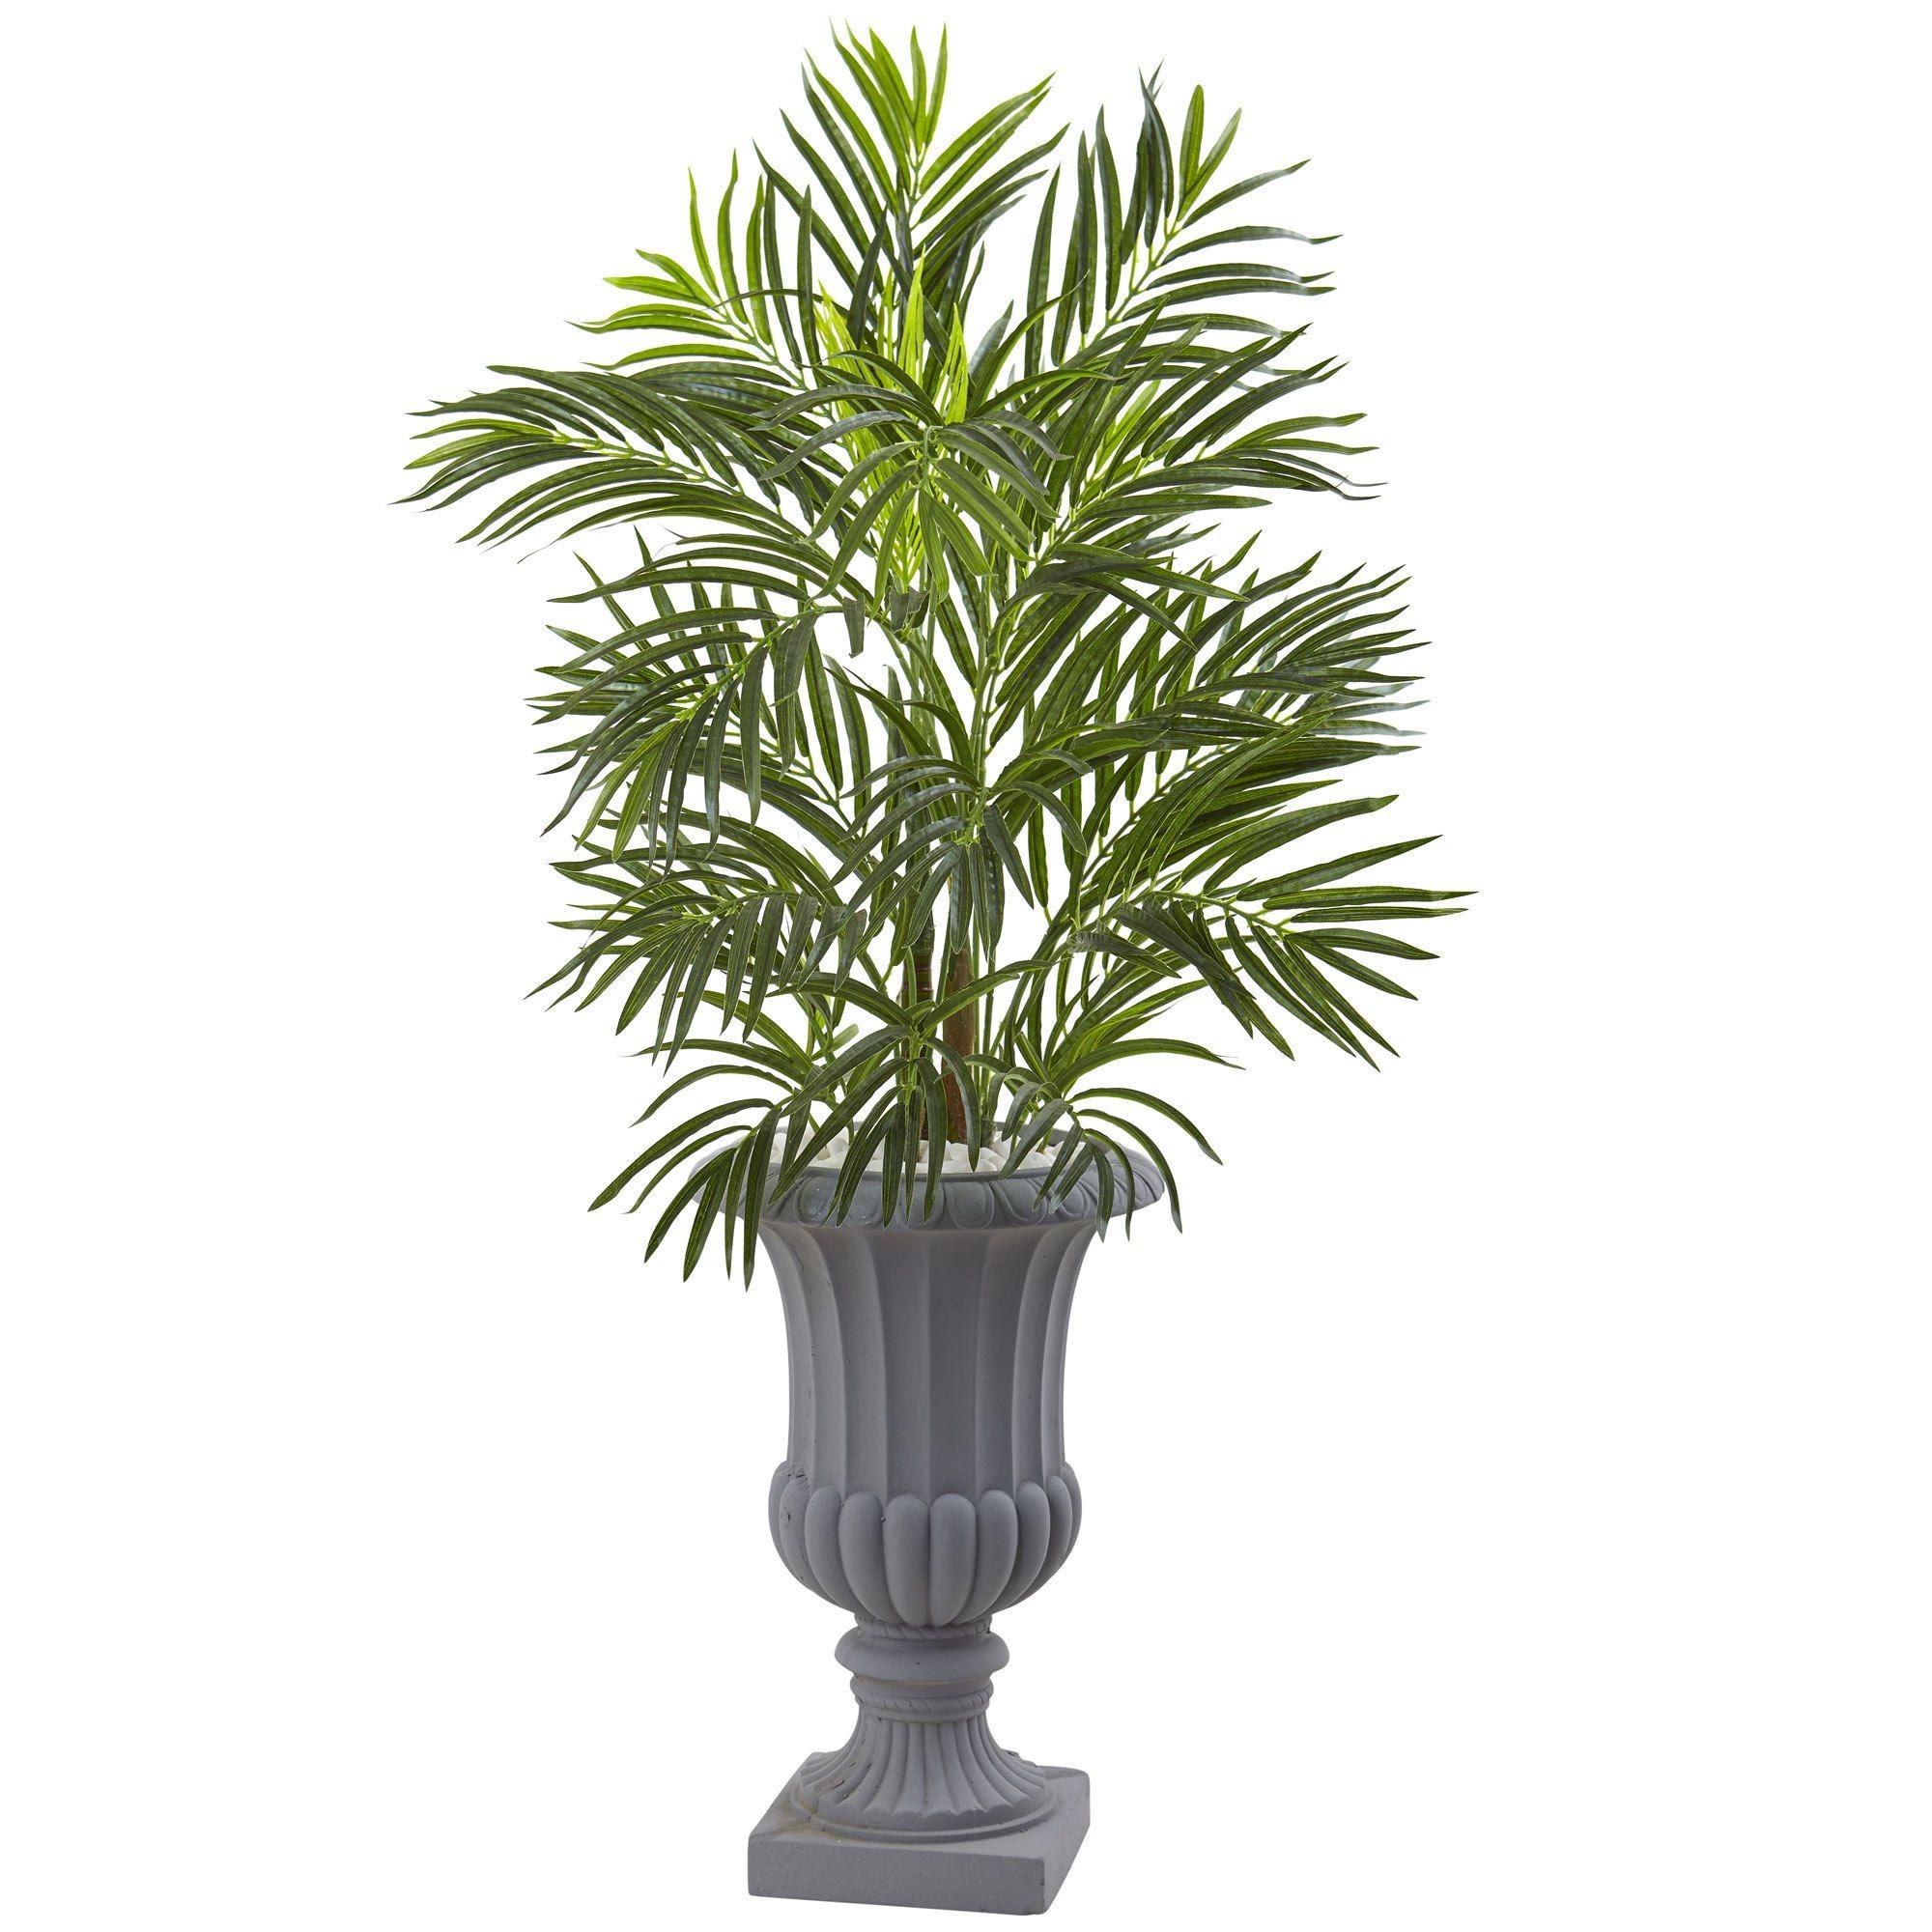 Areca palm tree with gray urn uv resistant indooroutdoor